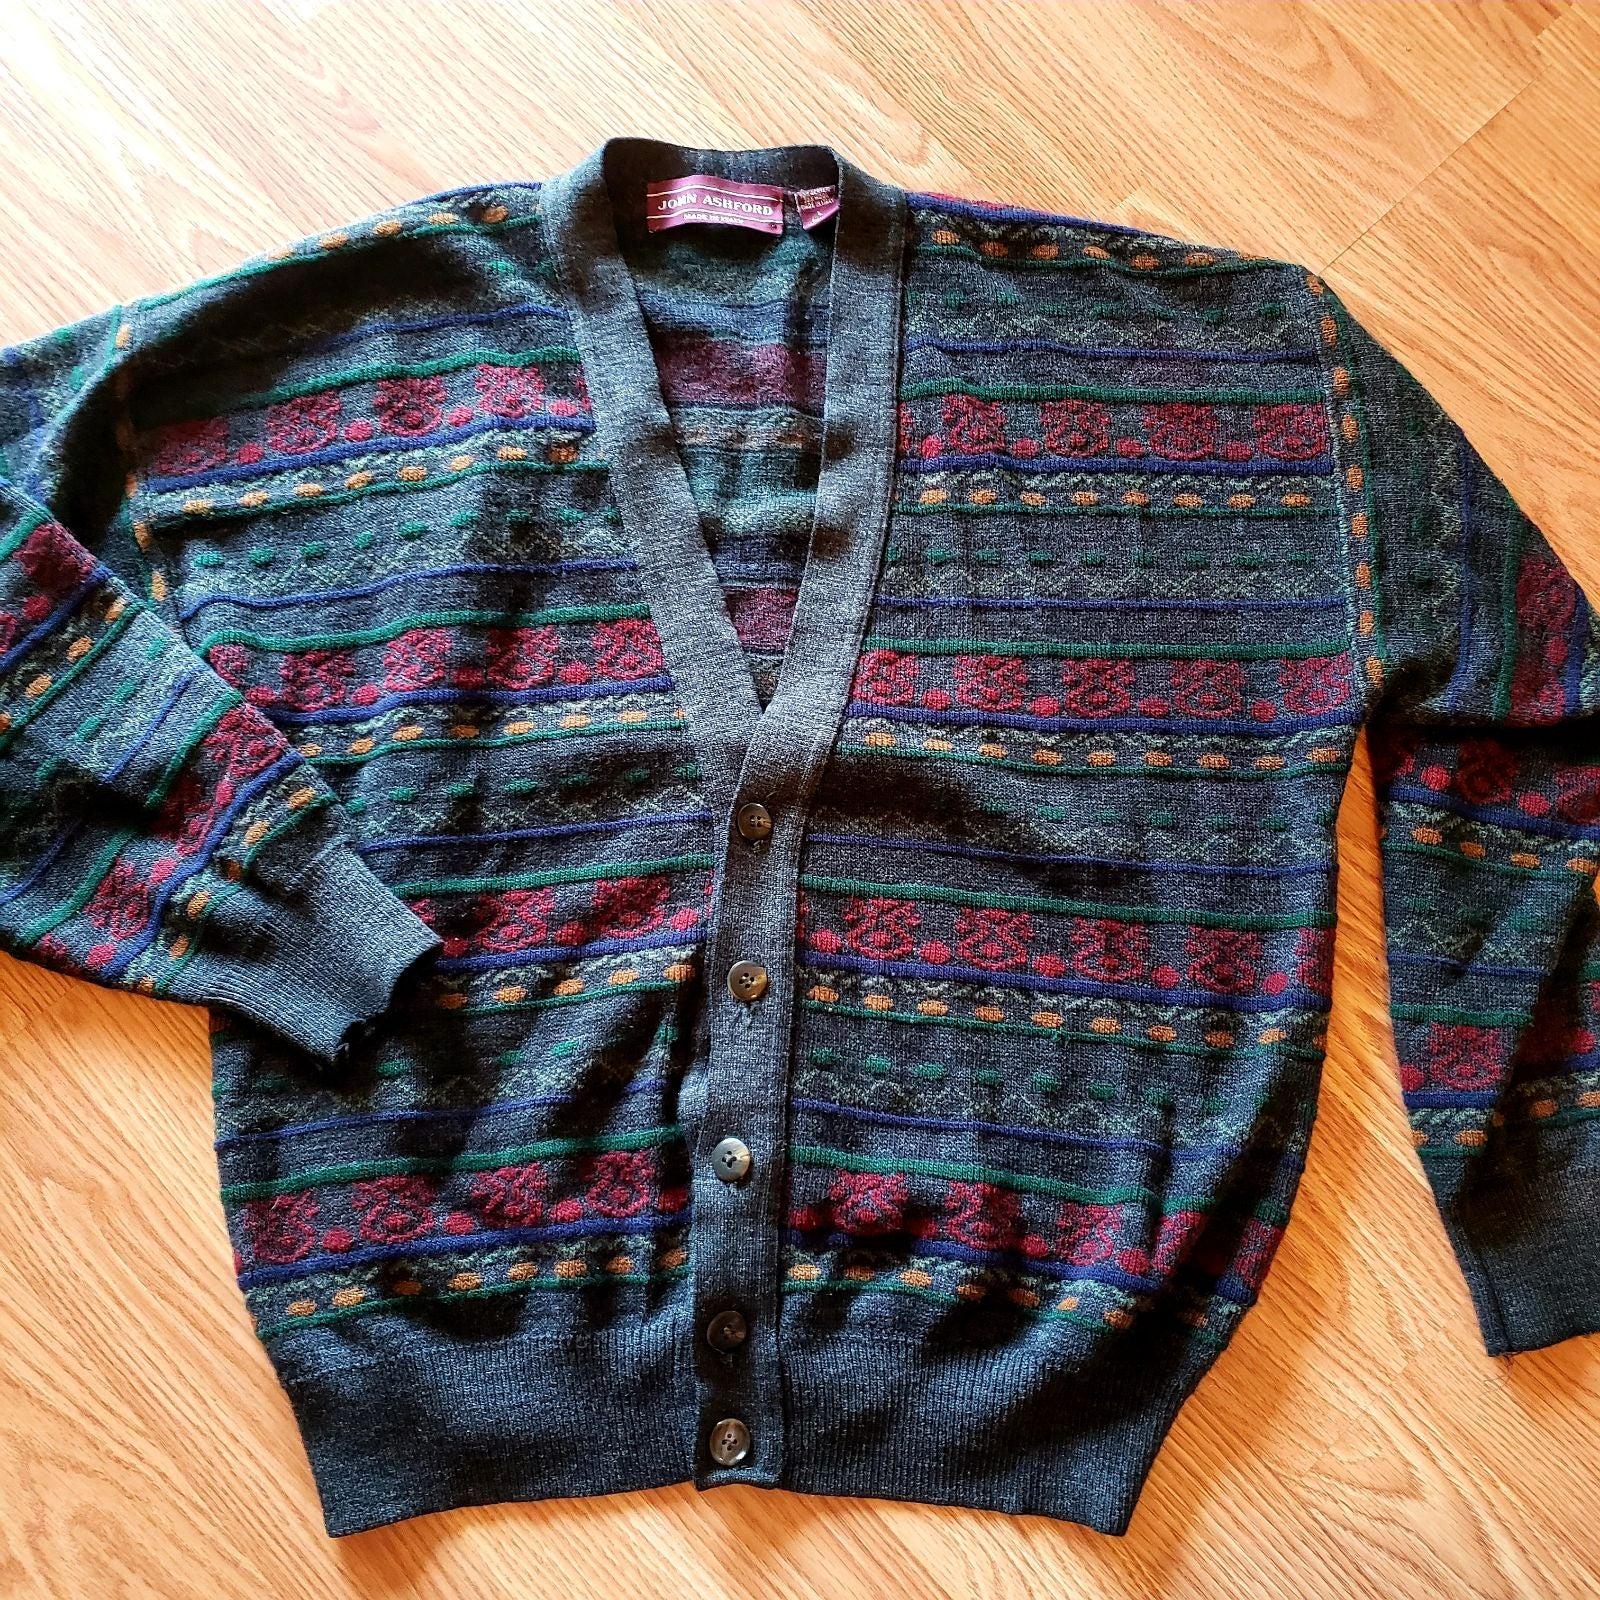 Vintage 90s John Ashford Sweater